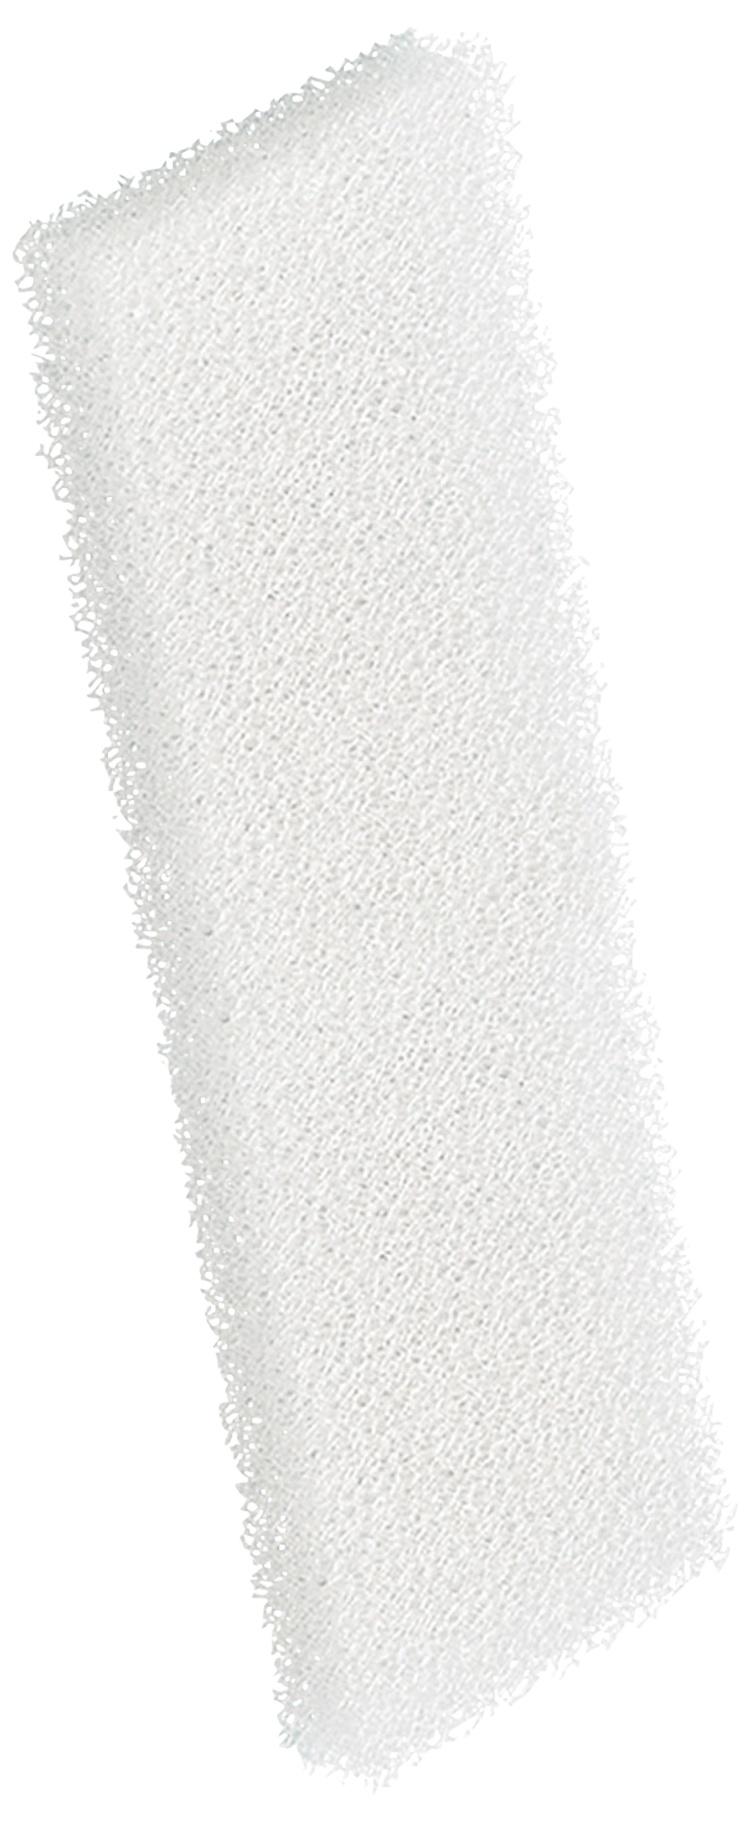 Akvārija filtru pildījums - Foam for Fluval U3